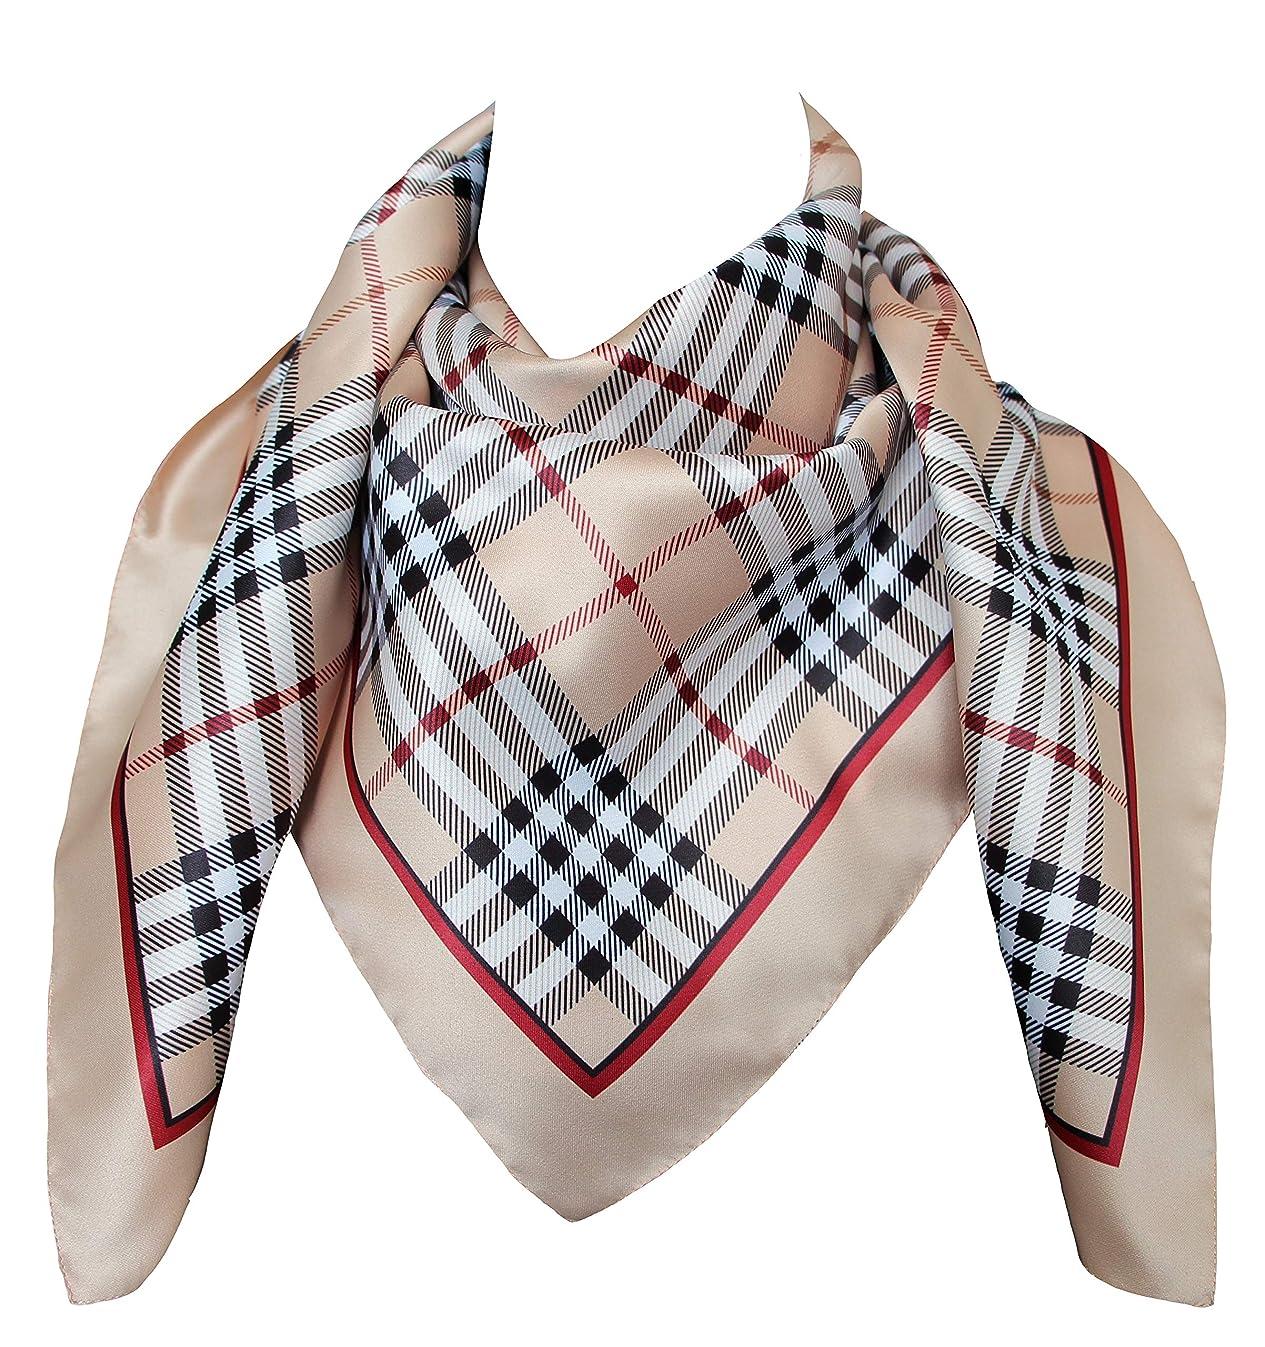 foulard dis 62689 var 1 size inch 36 x 36